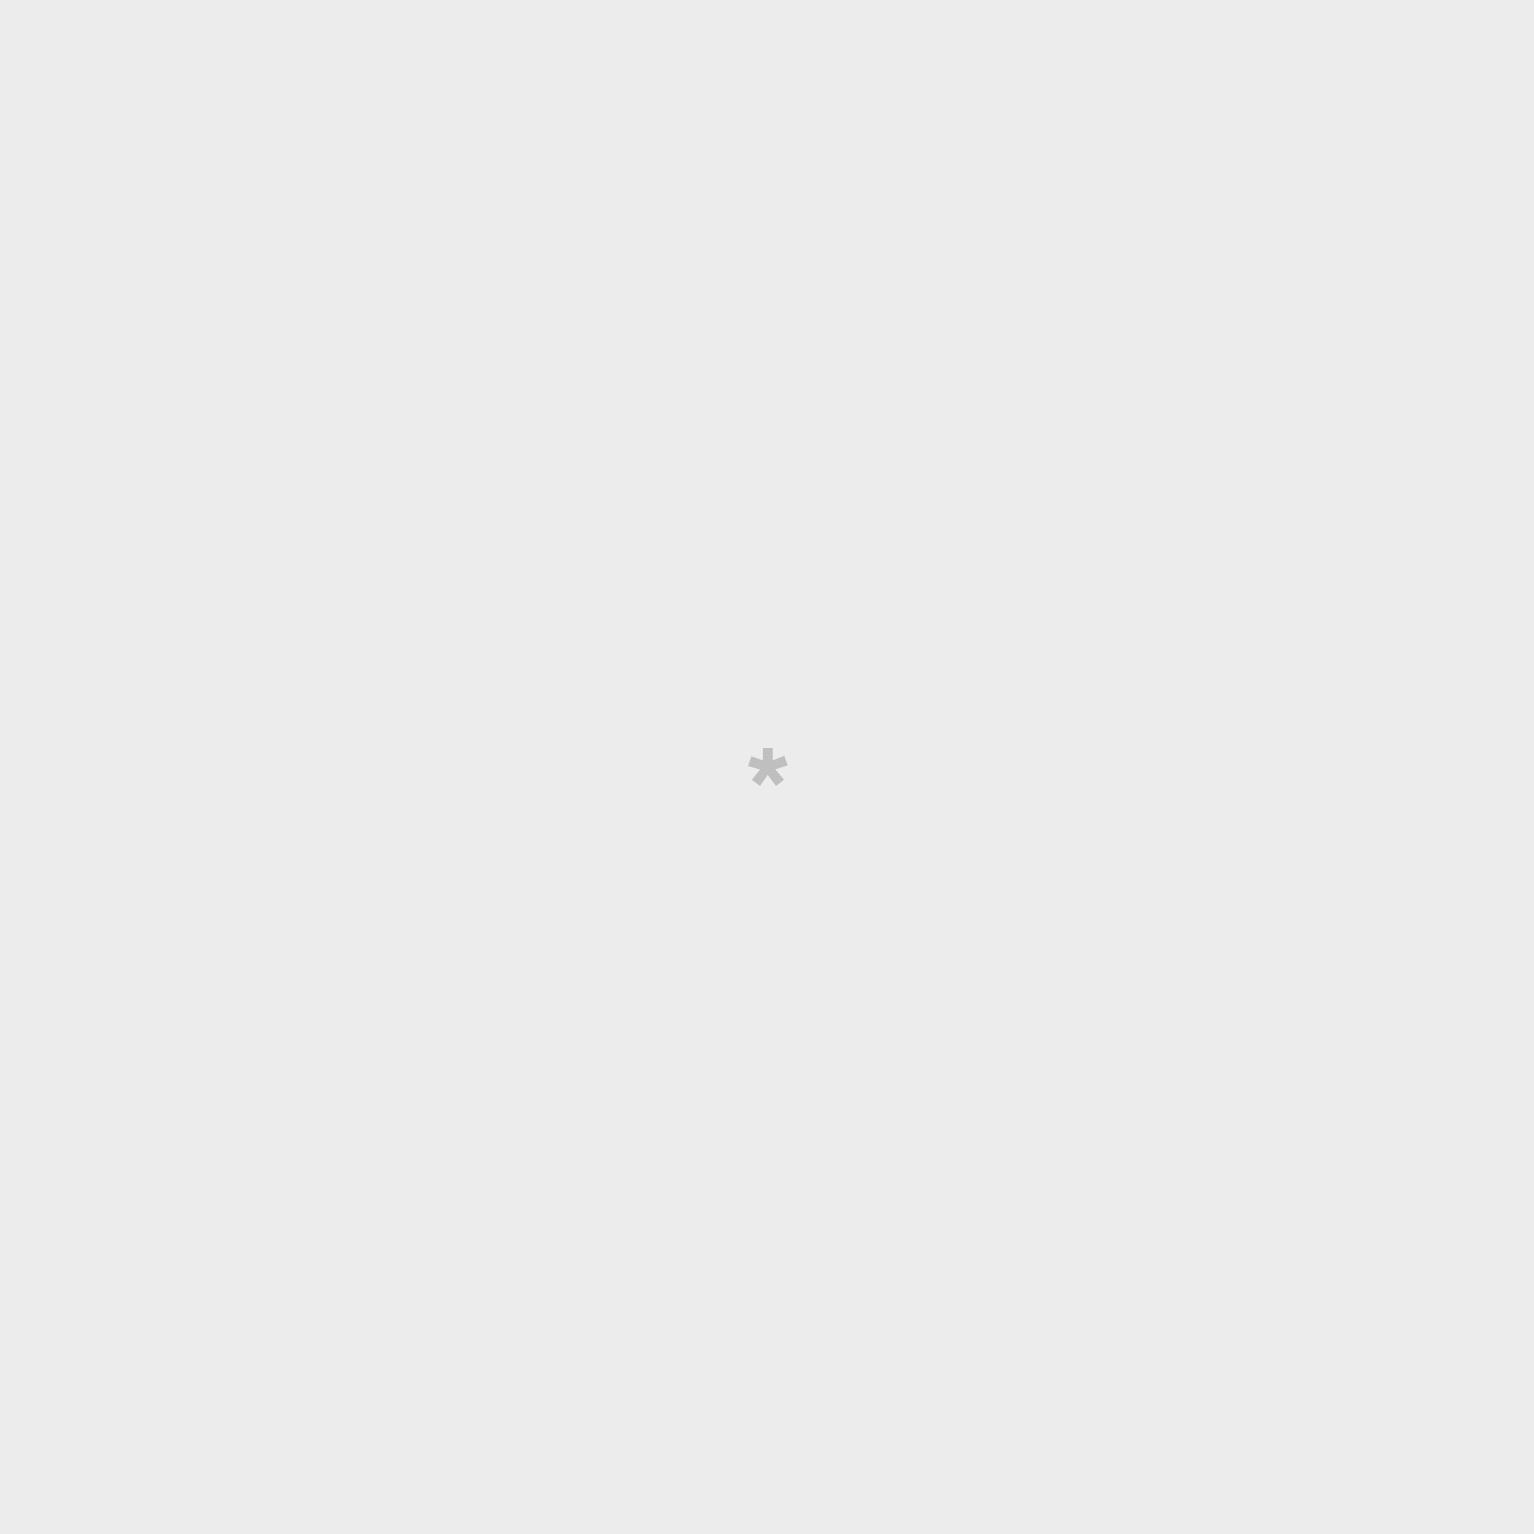 Pen - I like myself